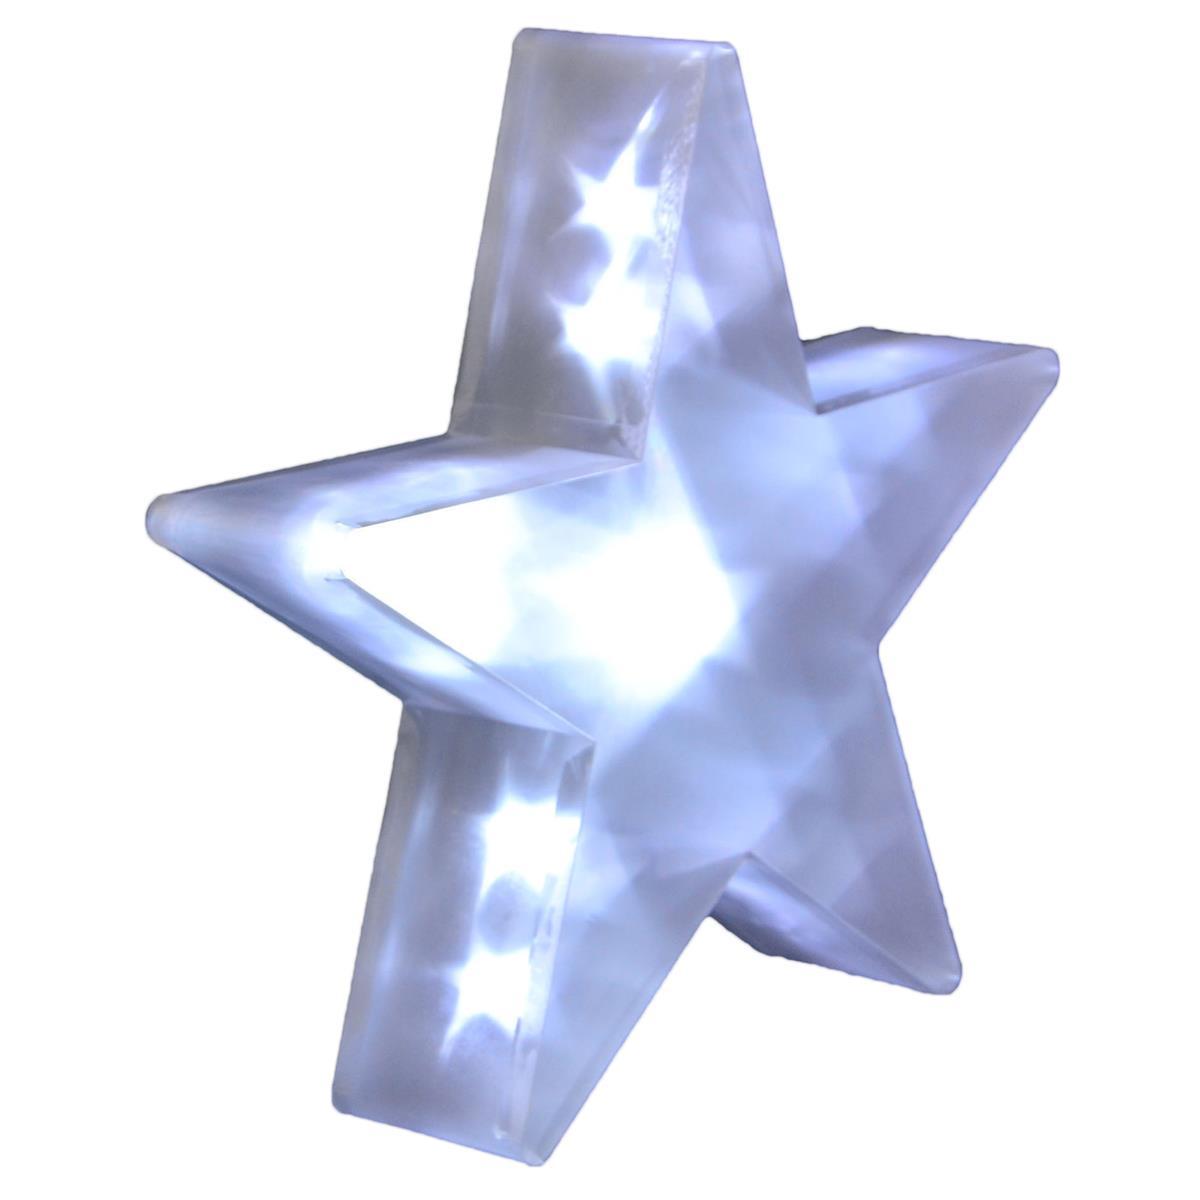 PVC Stern 3D Hologramm Effekt 20 LED Weihnachtsstern 35 cm Batterie mit Timer